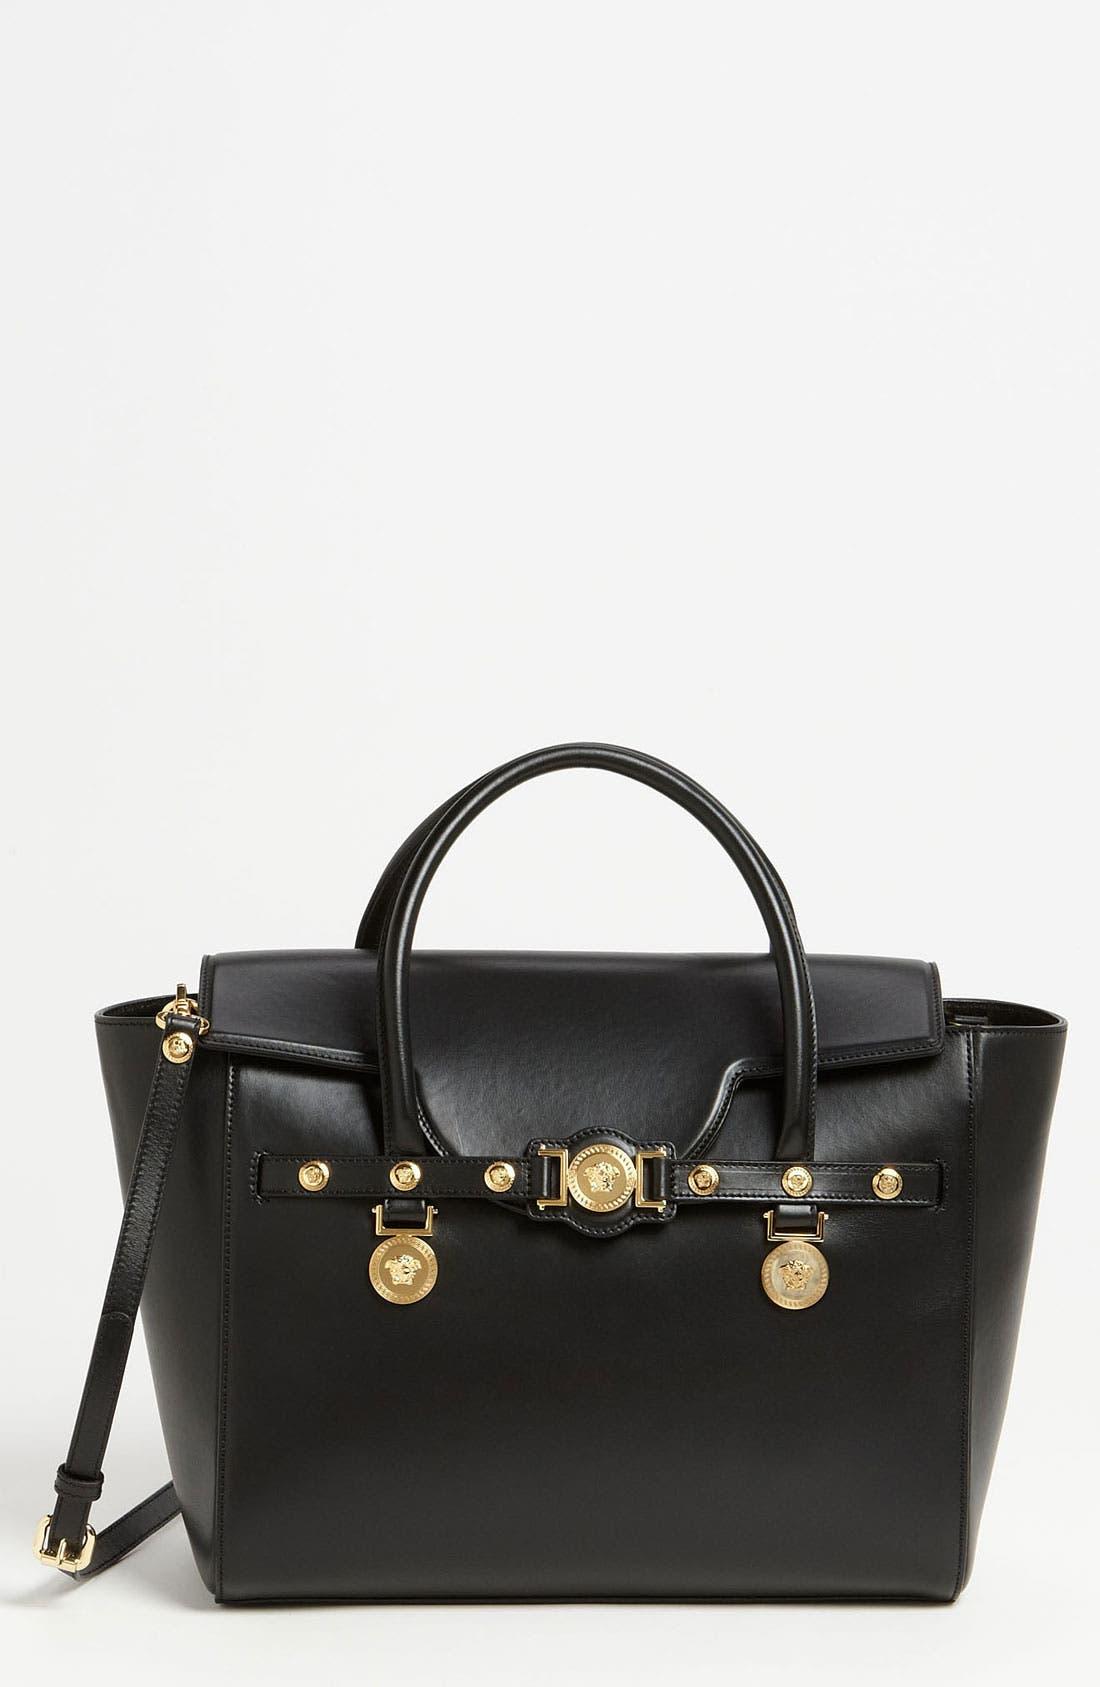 Main Image - Versace 'Classic' Leather Satchel